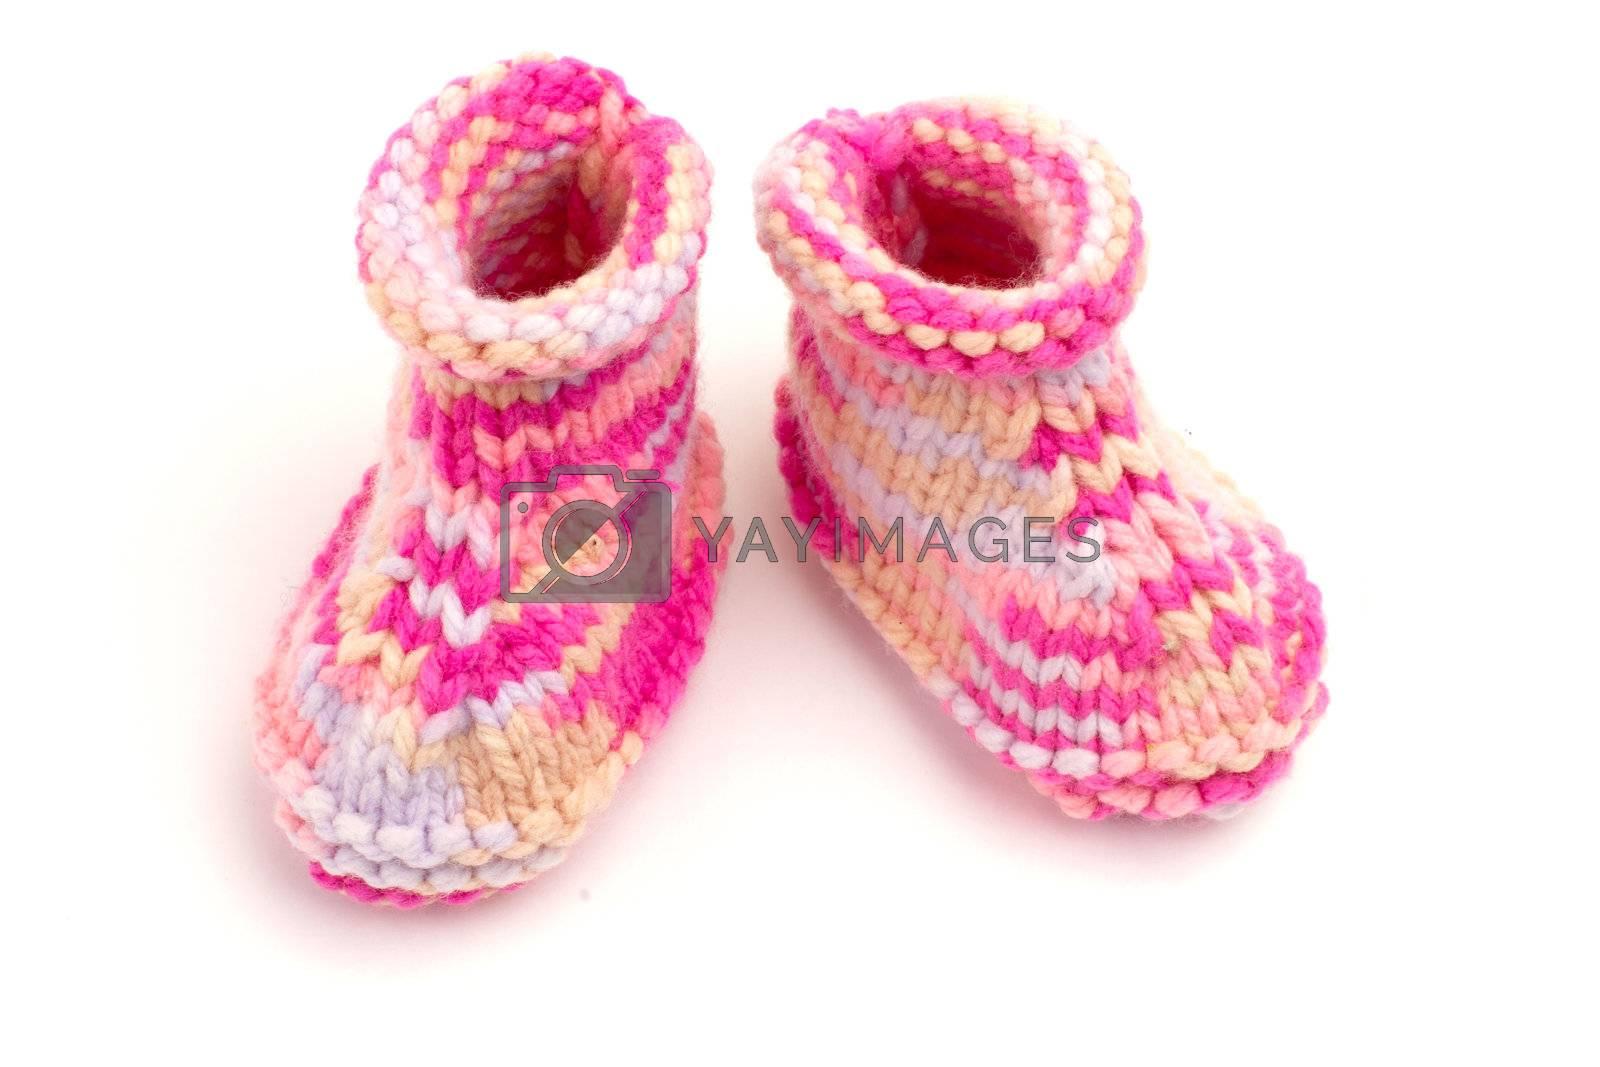 Royalty free image of baby slipper by niavuli